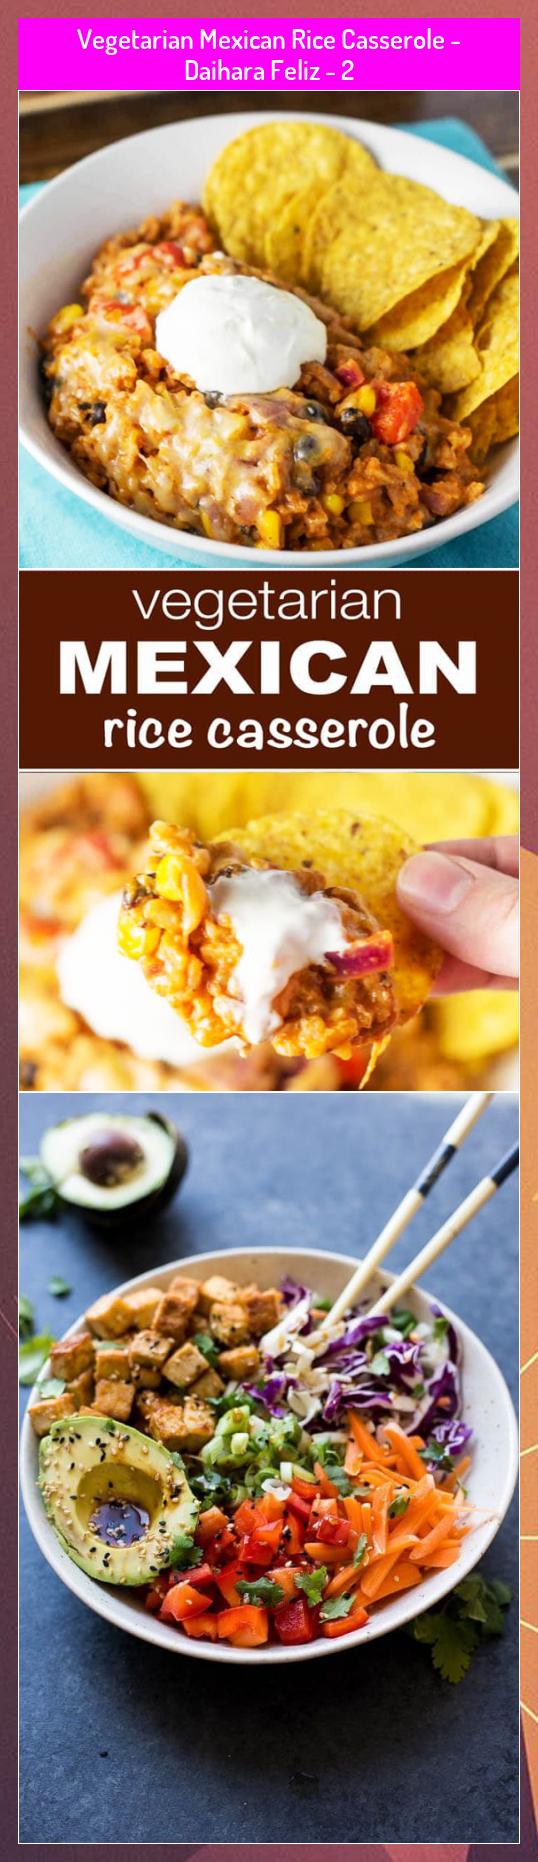 Vegetarian Mexican Rice Casserole - Daihara Feliz - 2 #Casserole #Daihara #Feliz #Mexican #Rice #Vegetarian